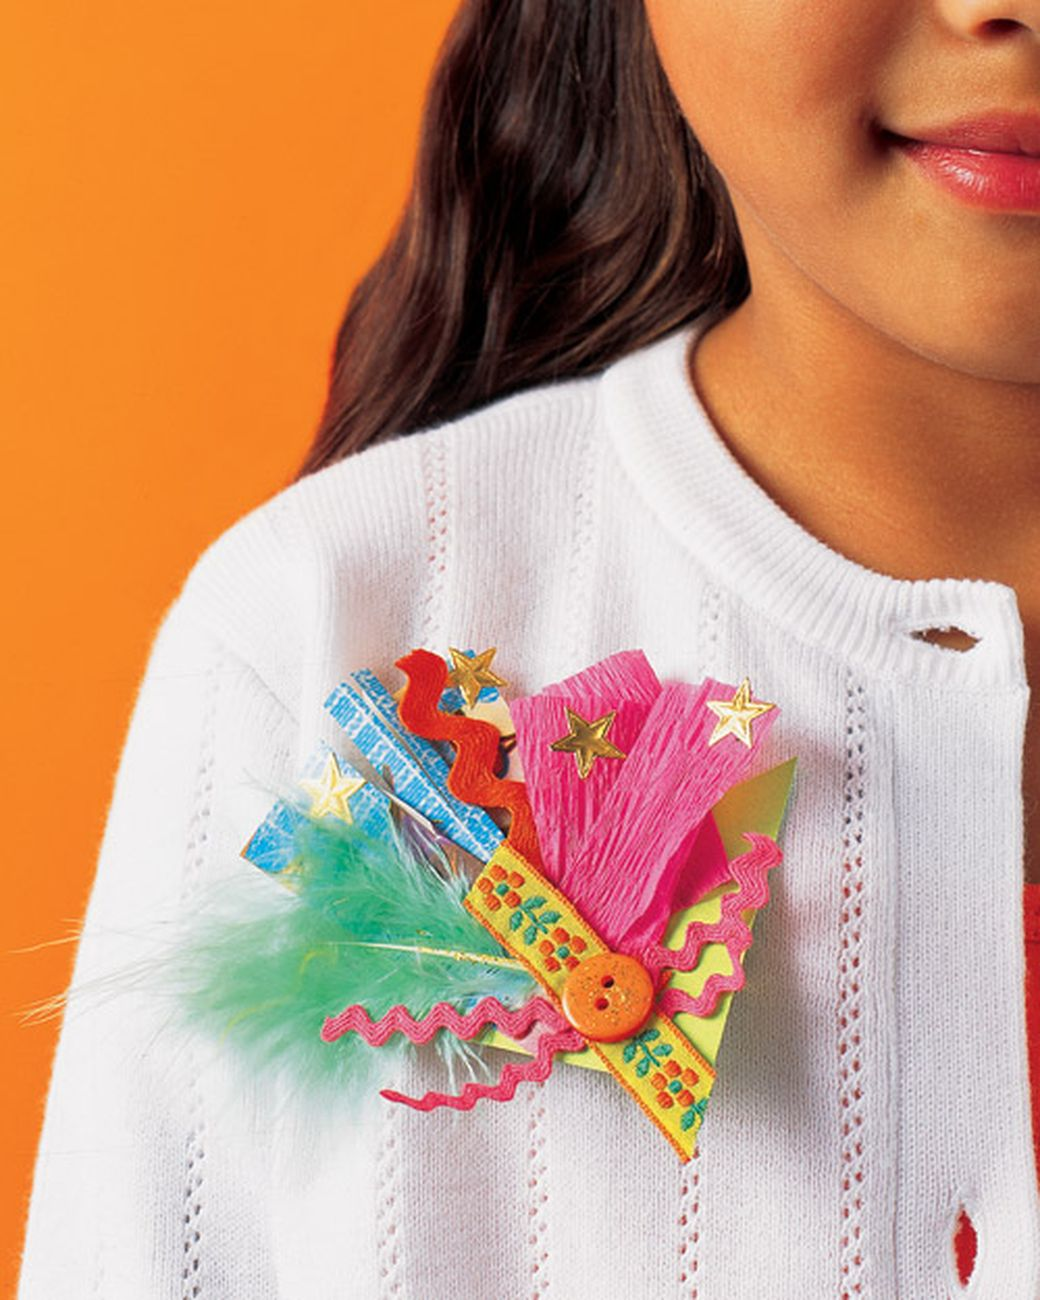 After-School Crafts | Kids party crafts, Martha crafts, Crafts for kids